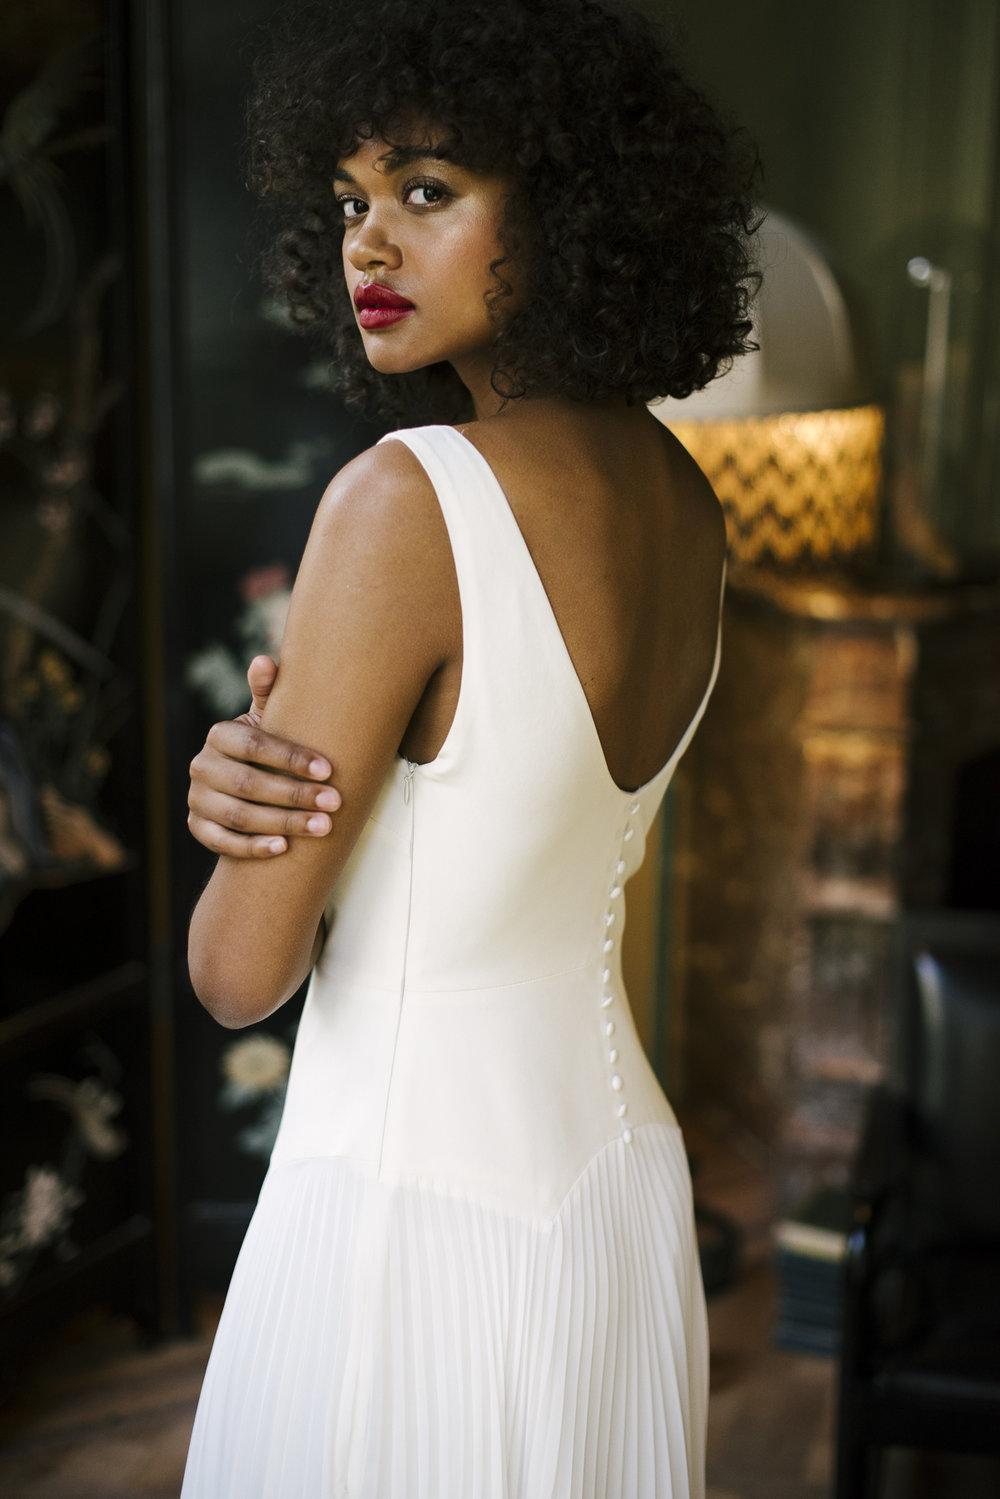 valentine-avoh-robe-mariee-rita-wedding-dress-bruxelles-photo-elodie-timmermans-3.jpg